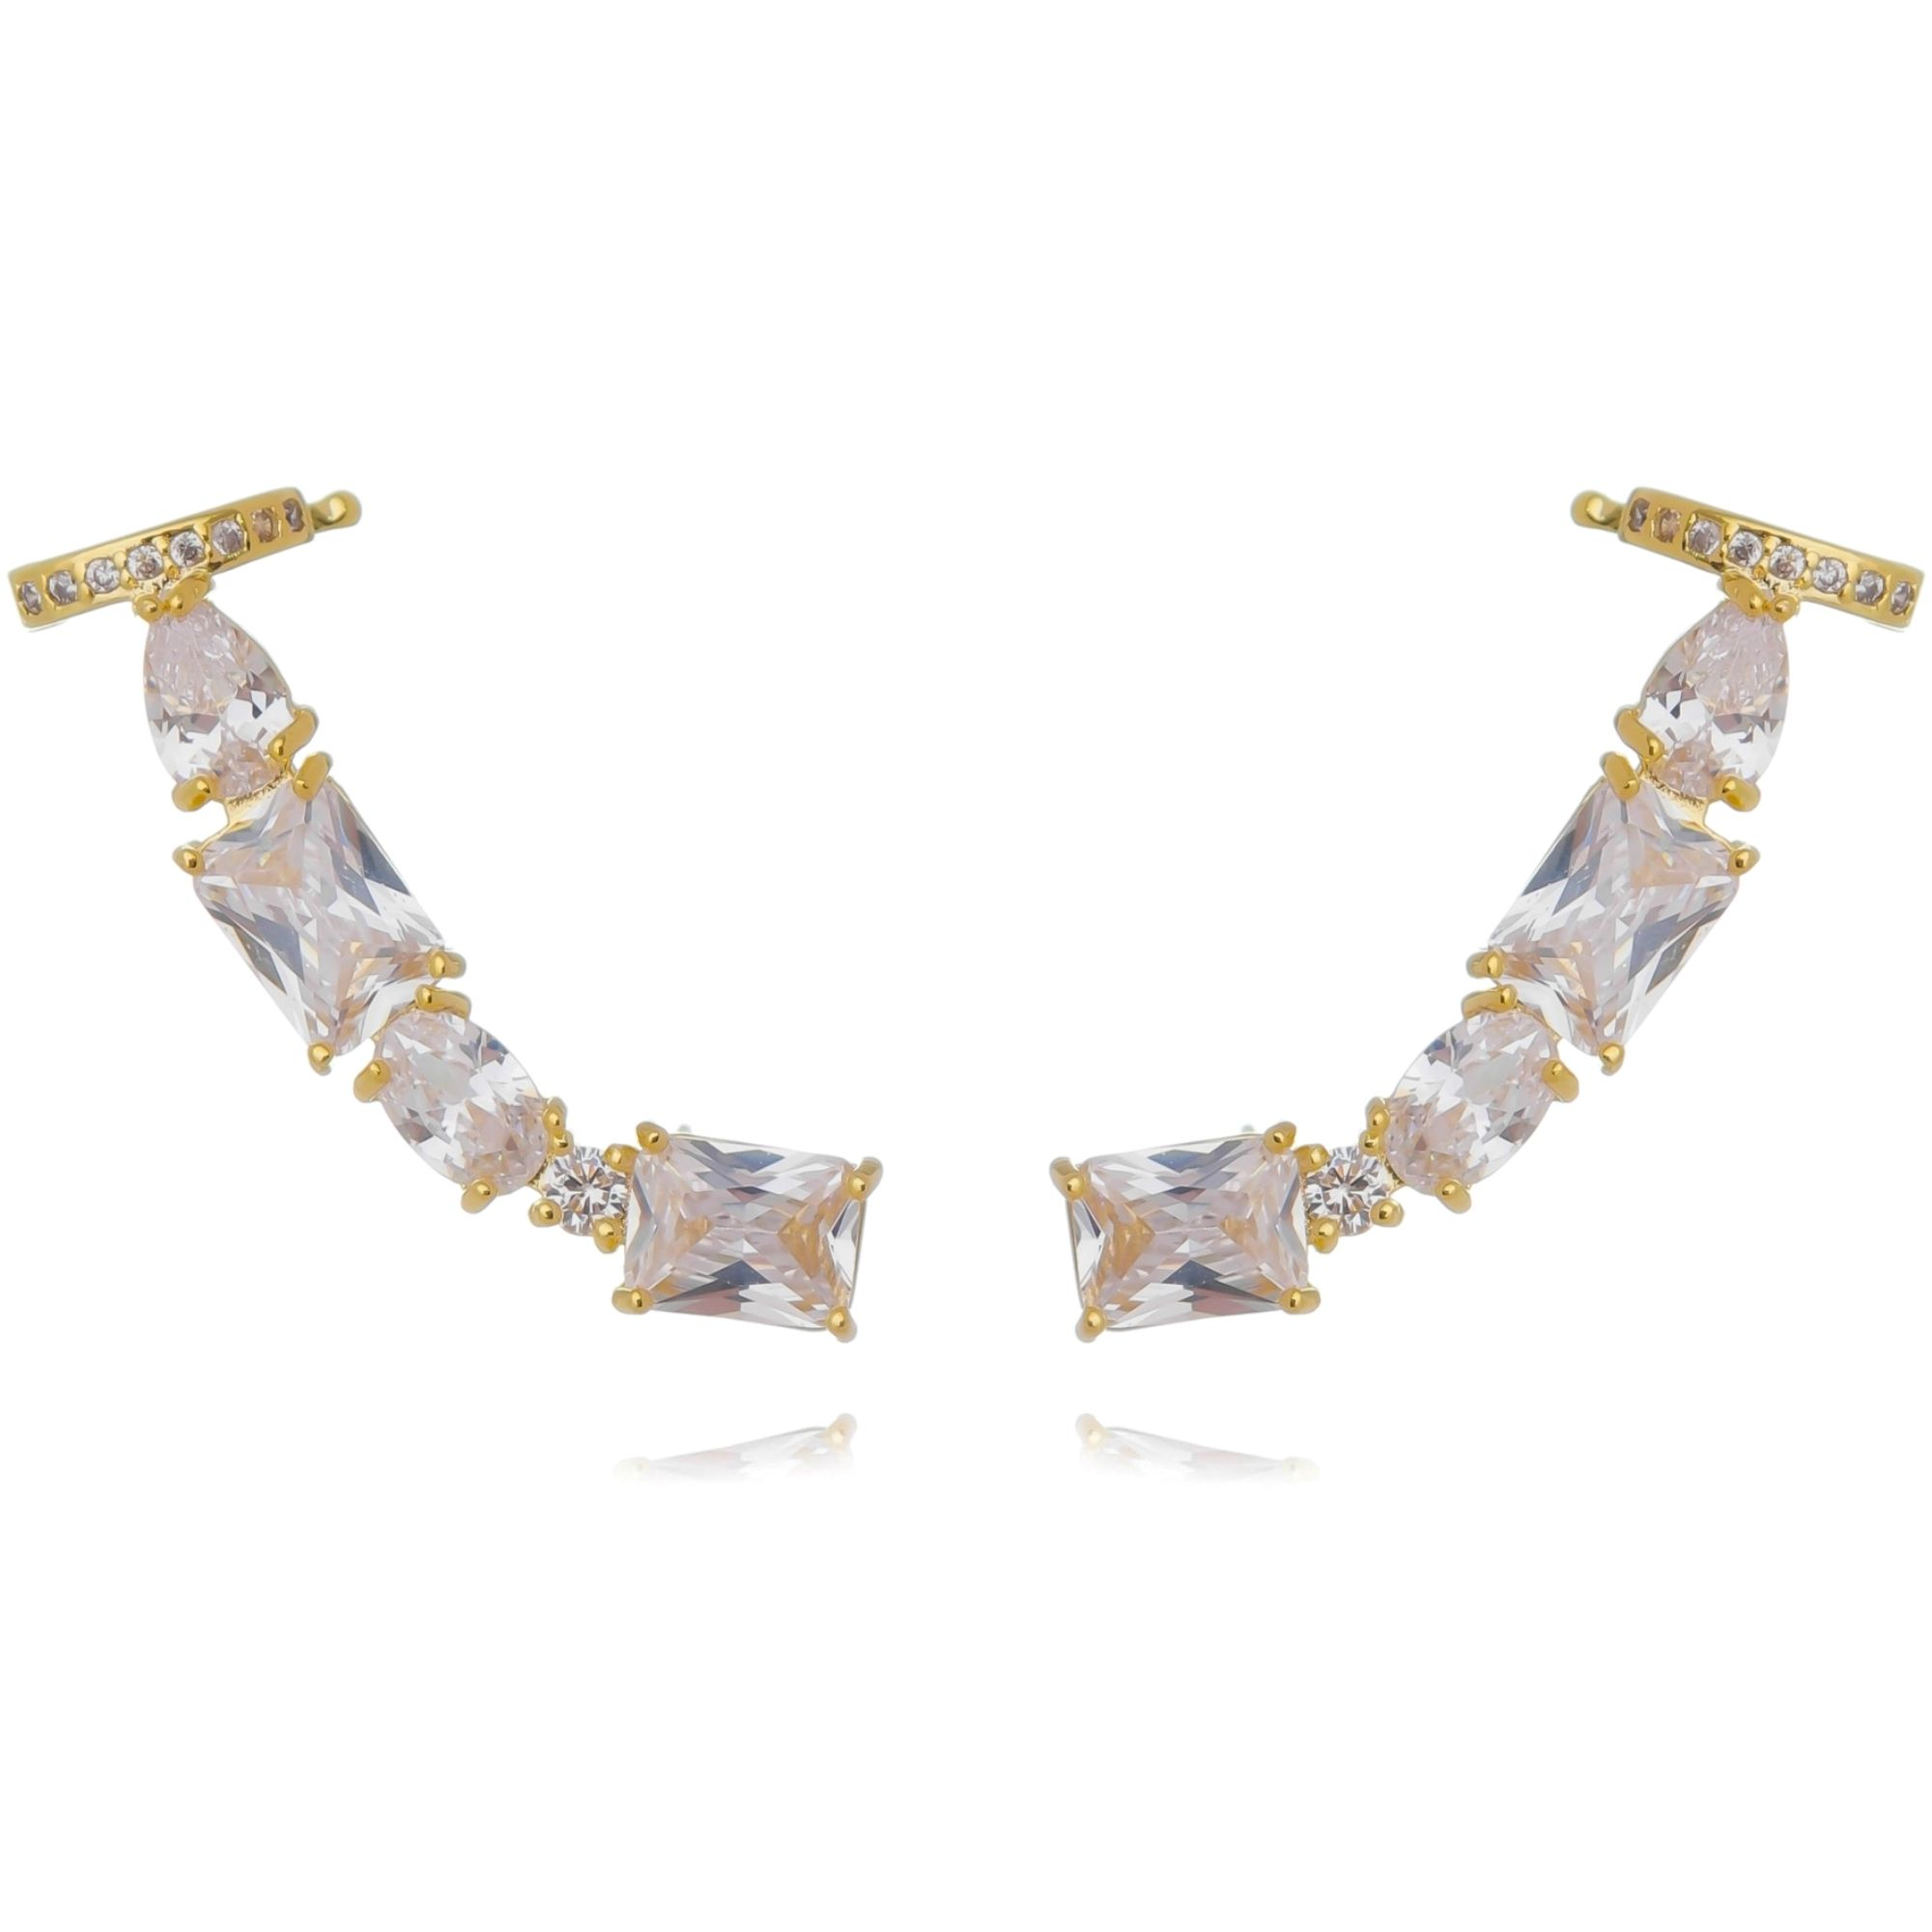 Ear Cuff para Festa Zircônia Branca com Piercing Semijoia Ouro  - Soloyou